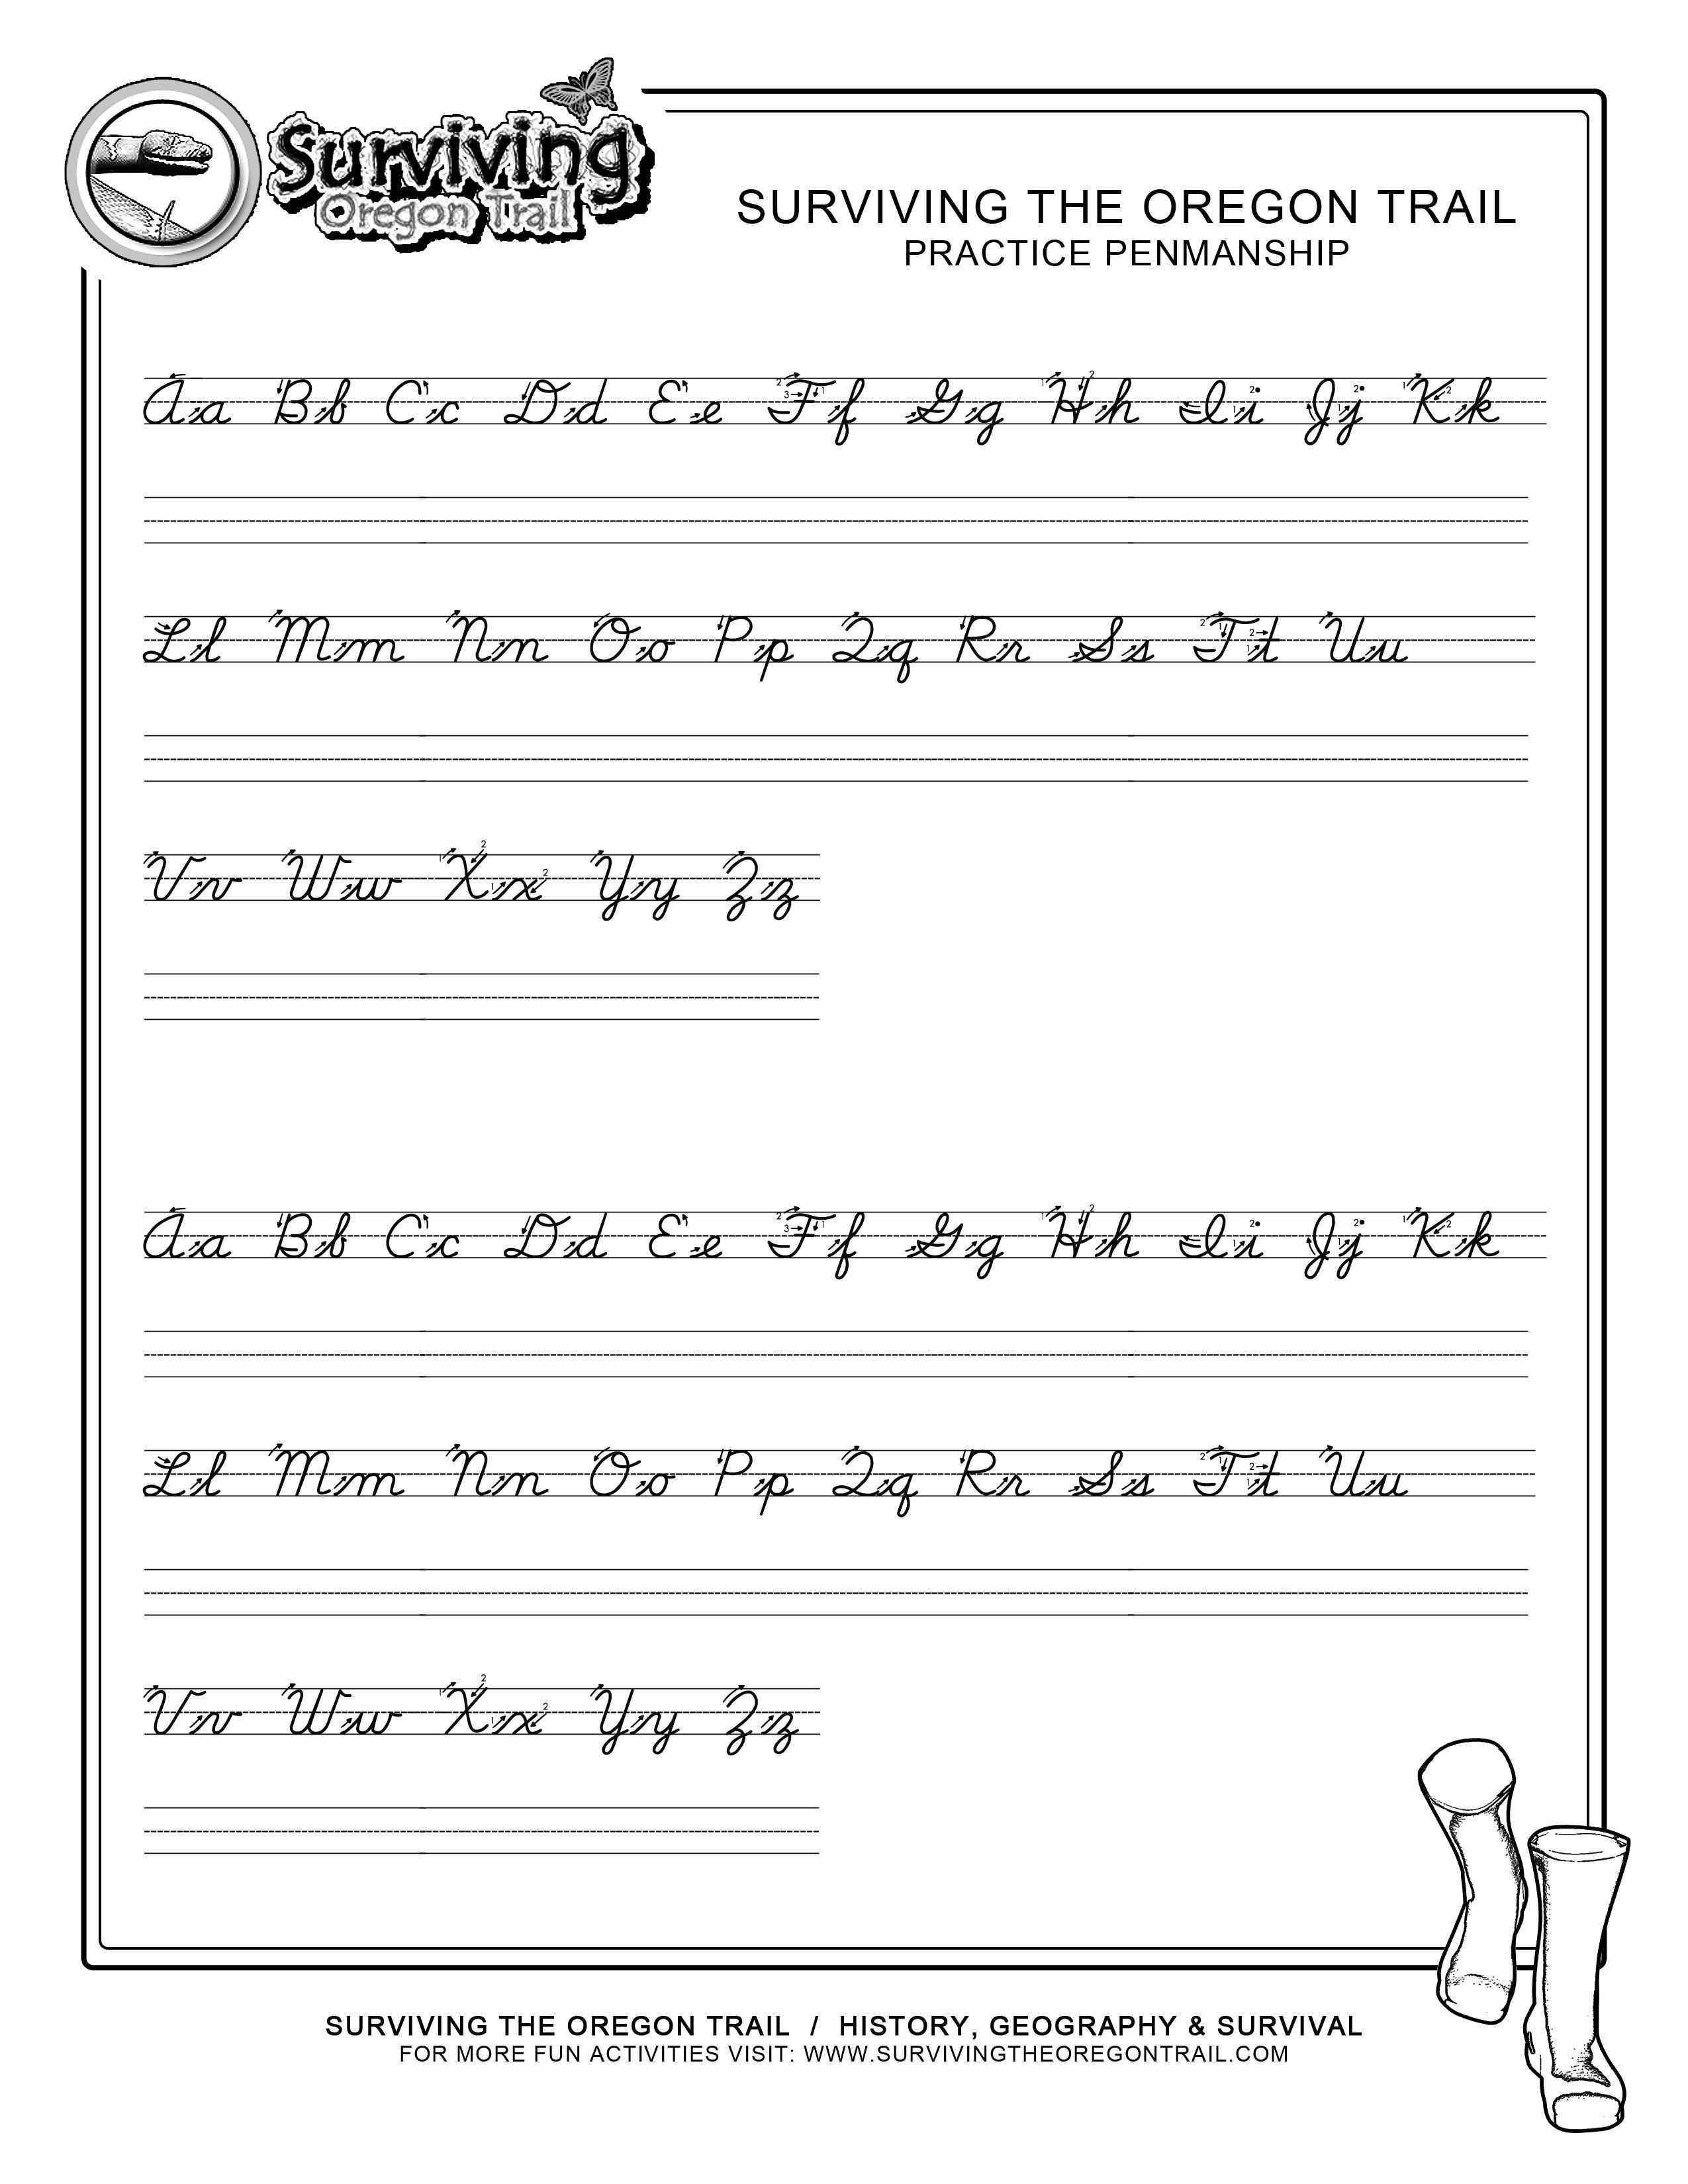 Practice Penmanship – Free Abc's Printable Cursive Writing Worksheet | Free Printable Cursive Handwriting Worksheets